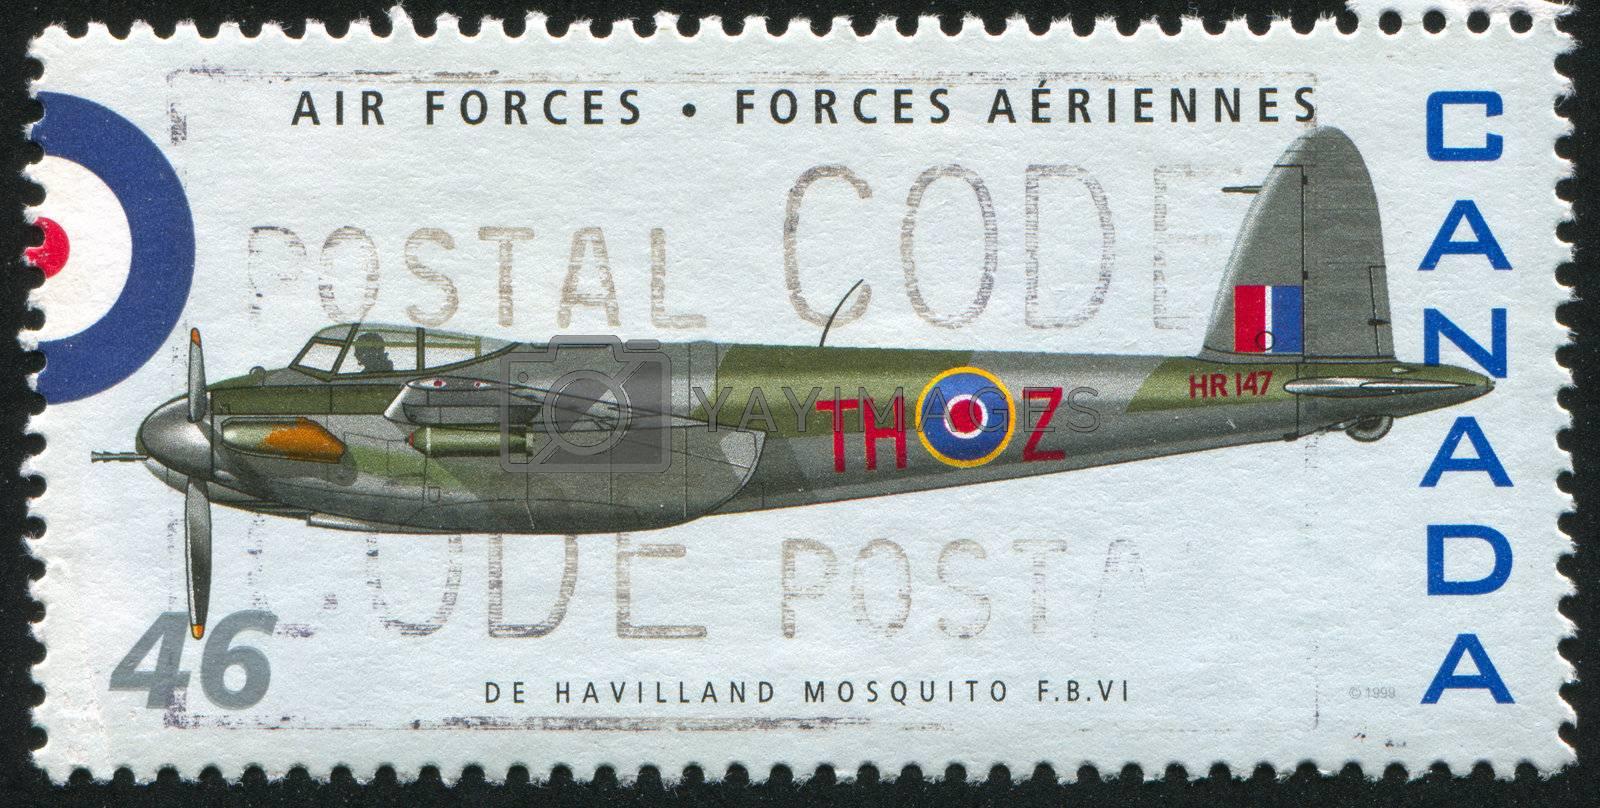 CANADA - CIRCA 1999: stamp printed by Canada, shows aeroplane, De Havilland Mosquito FBVI, circa 1999